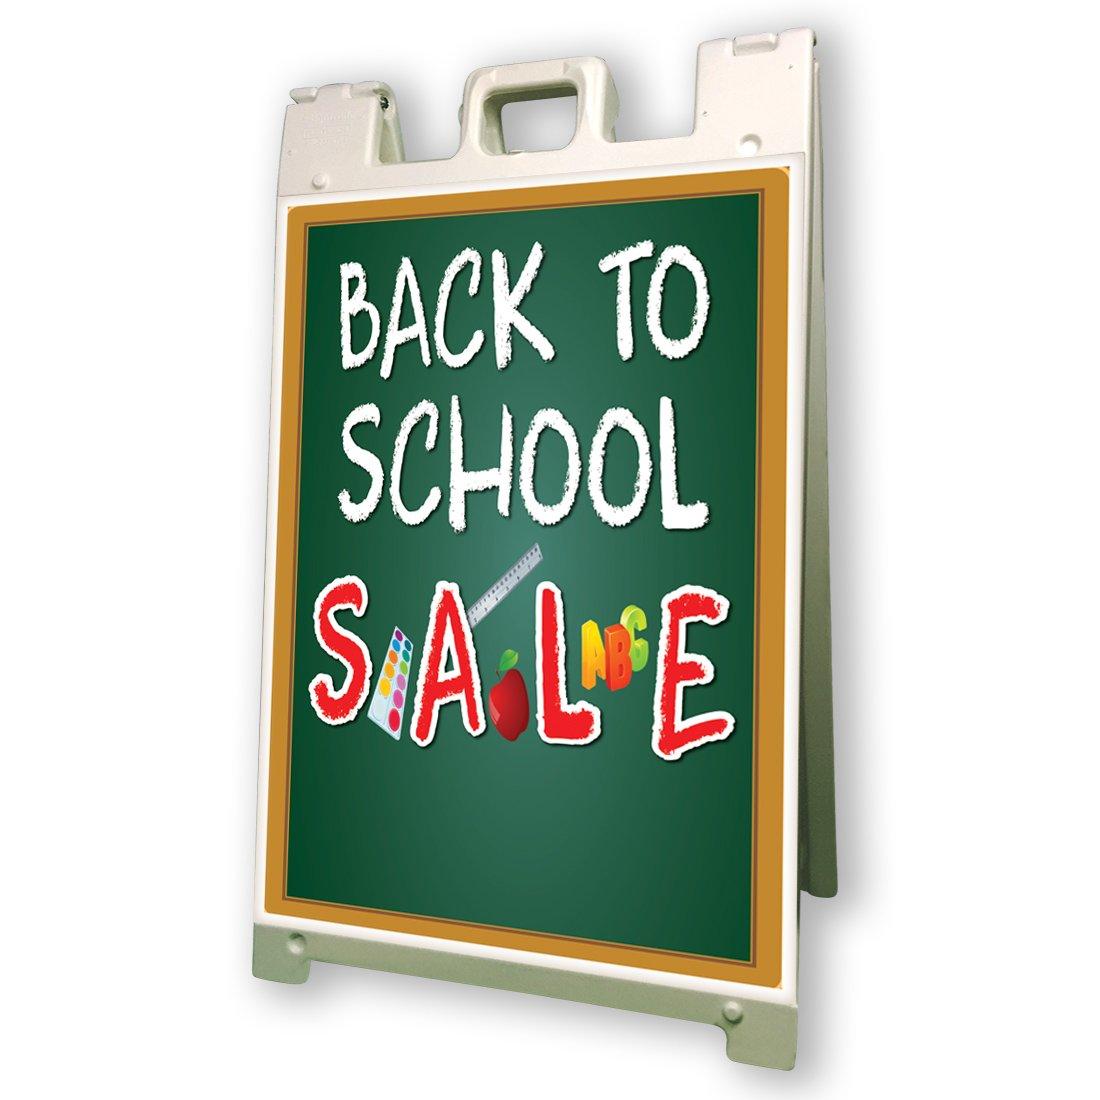 Back to School Sale Sidewalk A Frame 24x36 Outdoor Vinyl Retail Sign